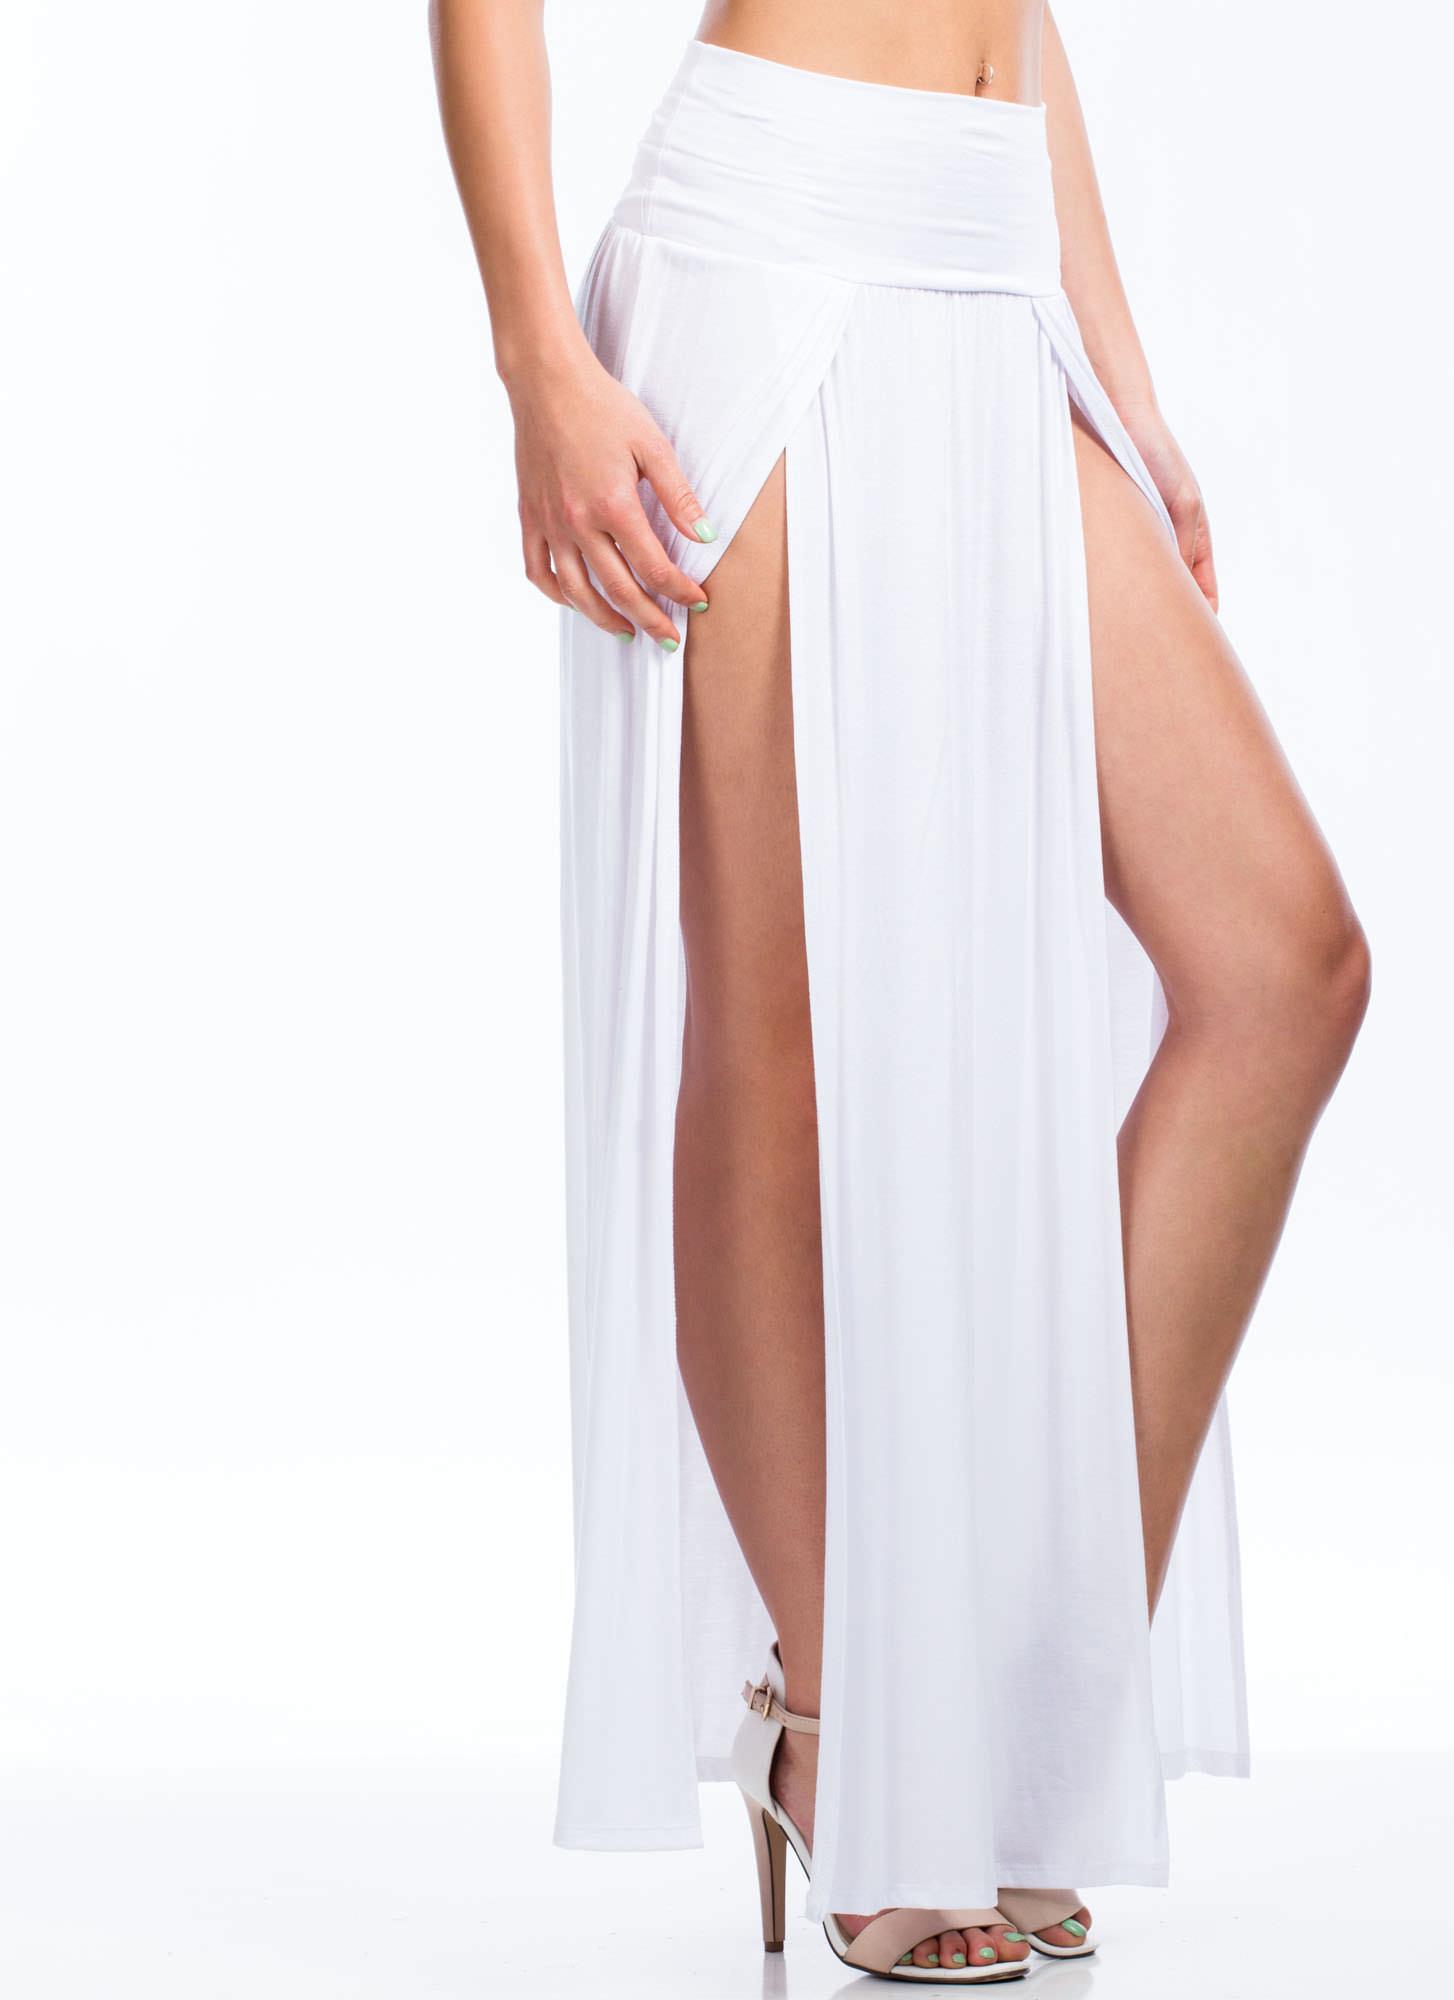 Slit Maxi Skirt - GoJane.com